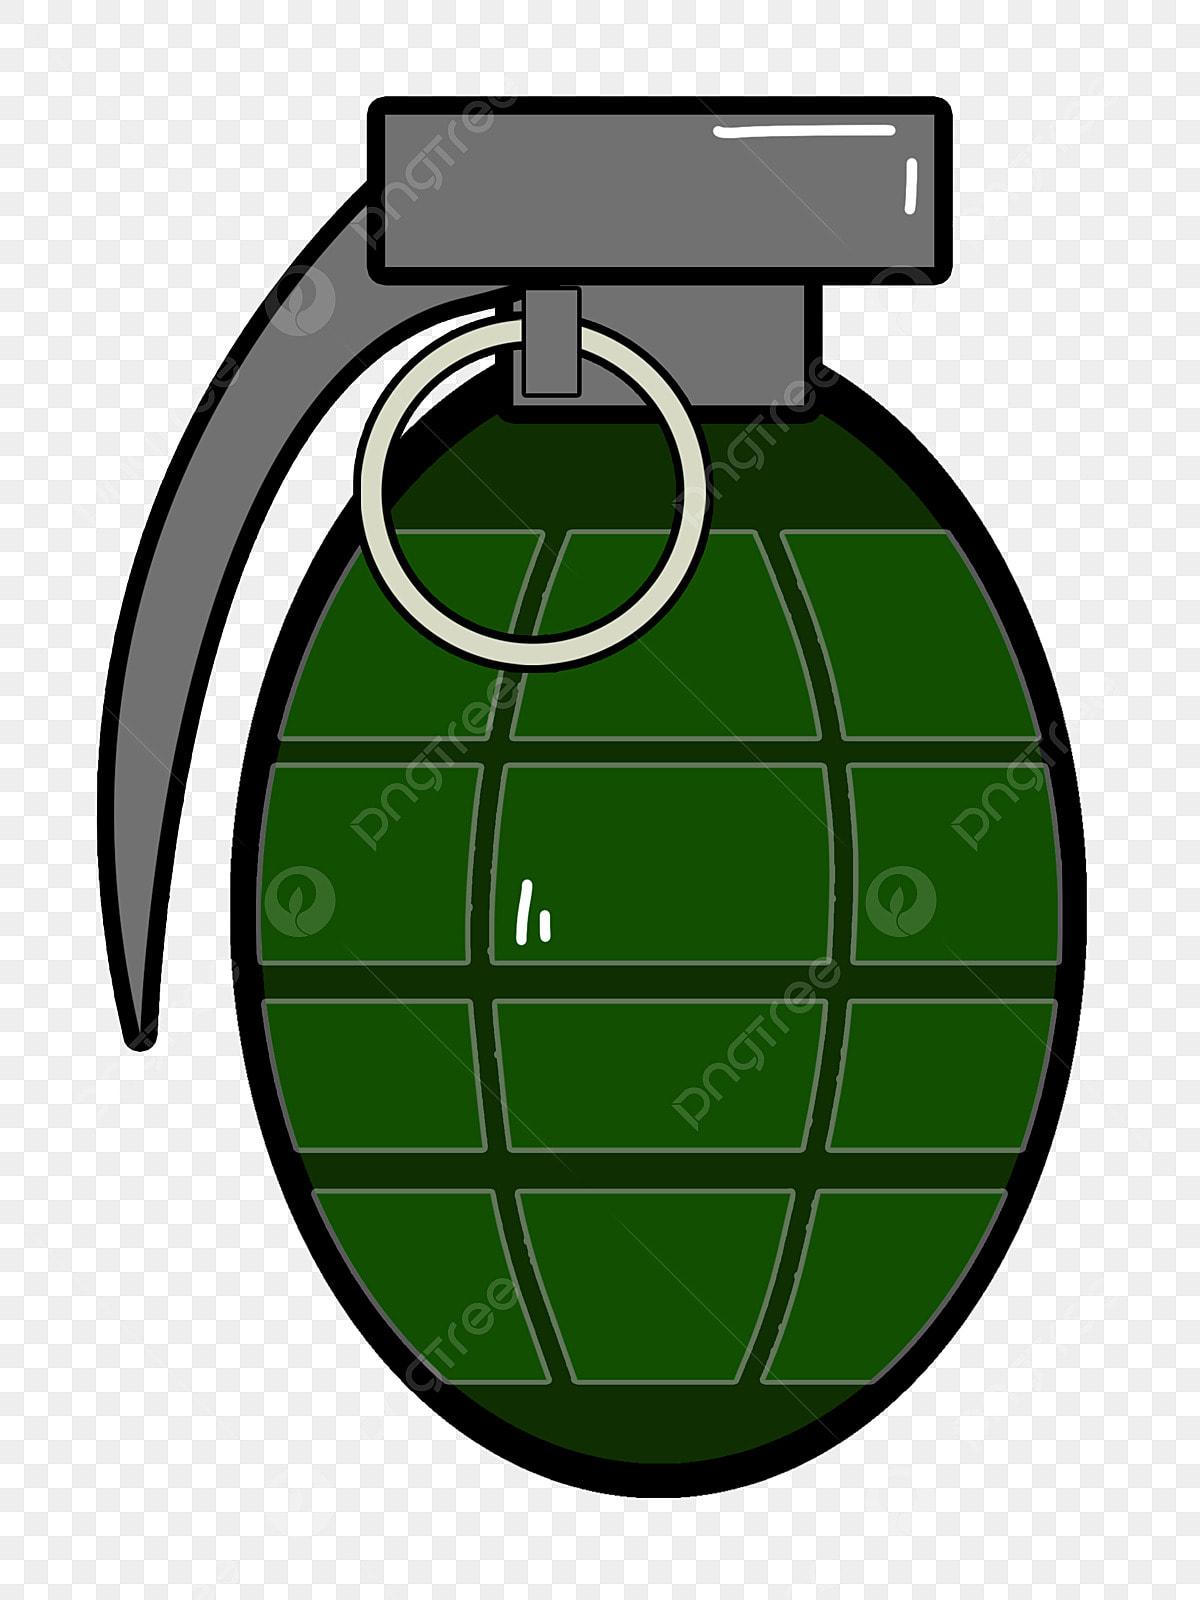 Bomba Dos Desenhos Animados Bomba Verde Granada Polvora